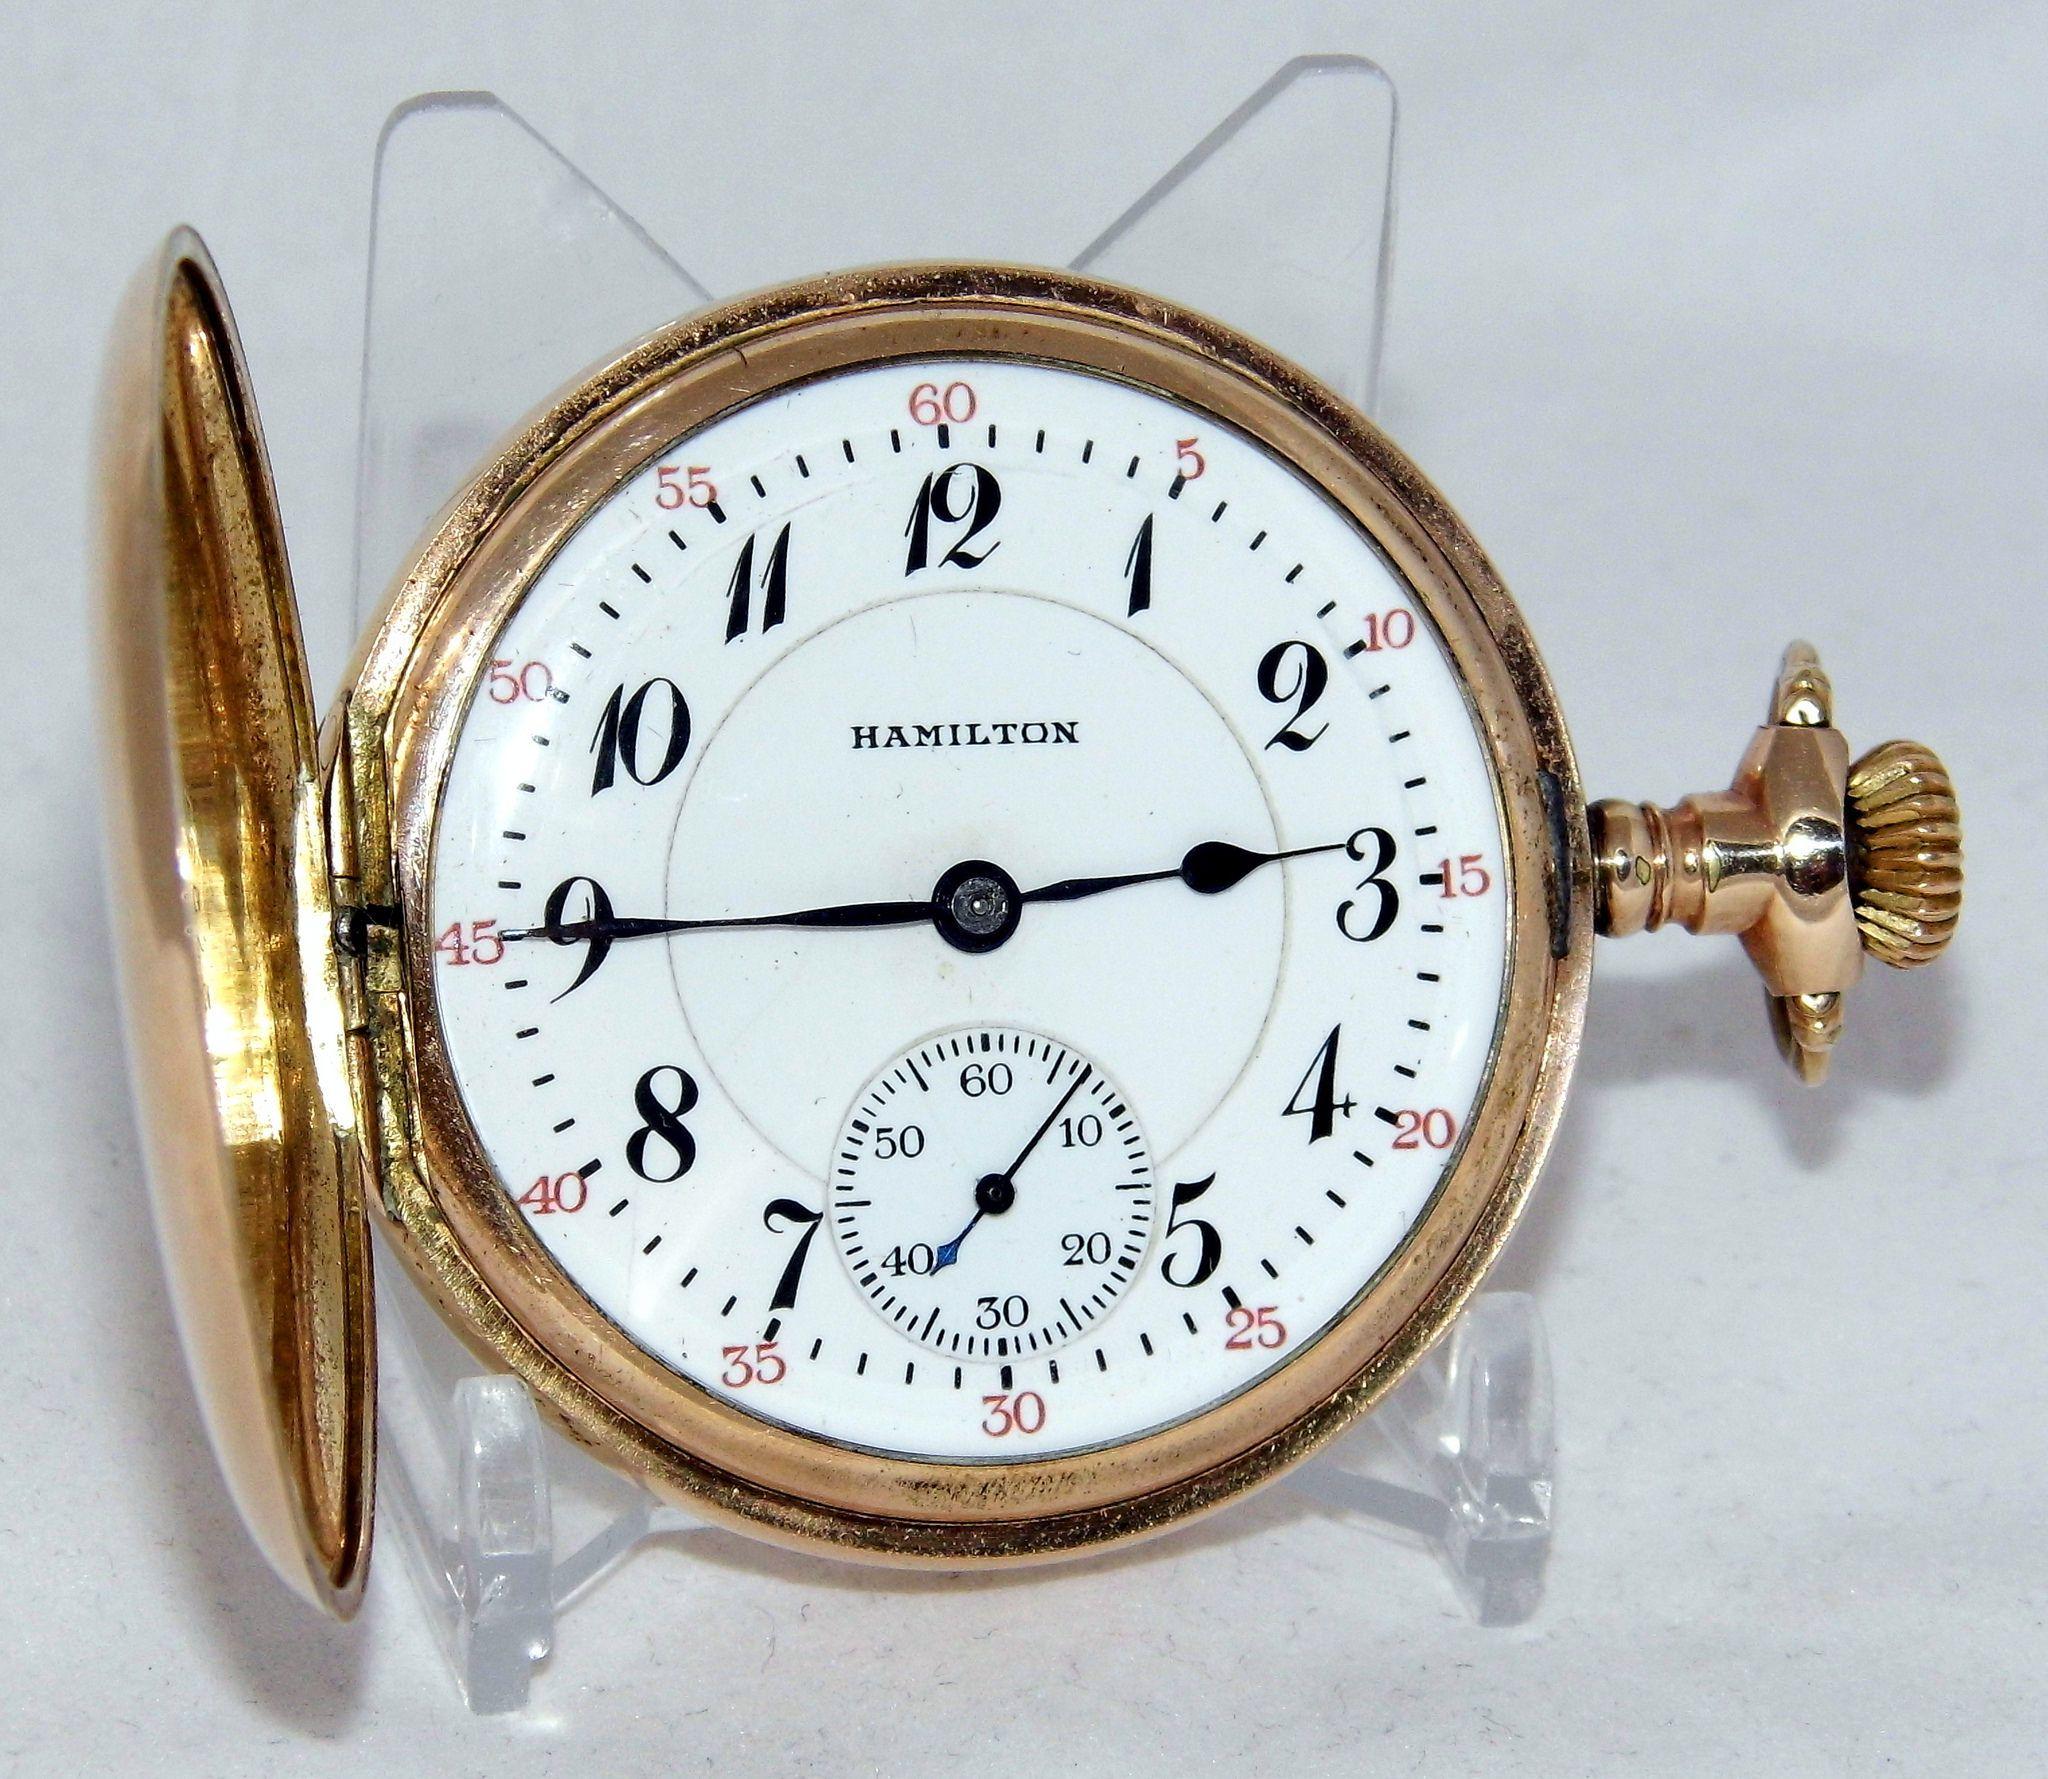 Vintage Hamilton Pocket Watch, Model 2, Grade 993, Size